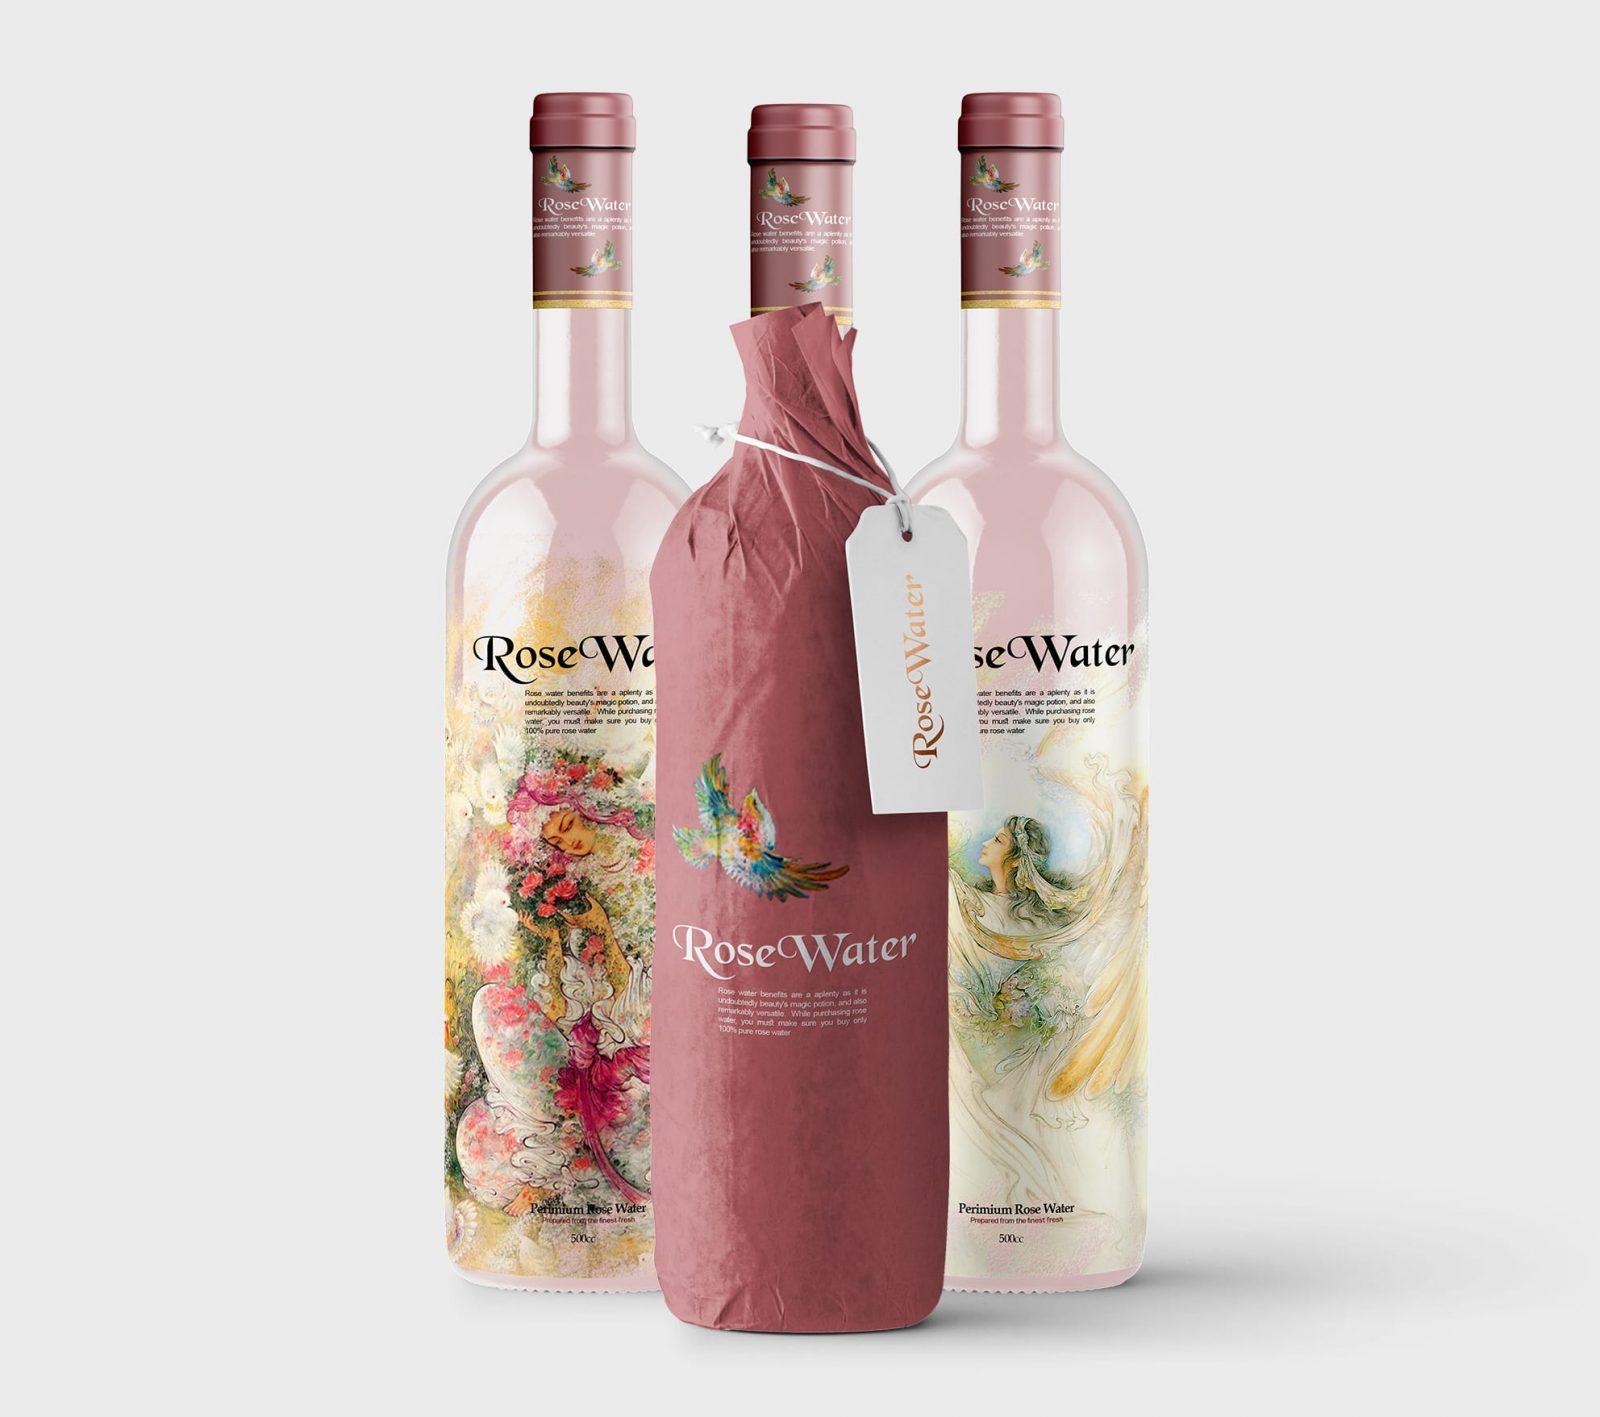 Rose water label Of Iran designed by Taha Fakouri rosewater - Iran Meets 90% of Global Rosewater Demand